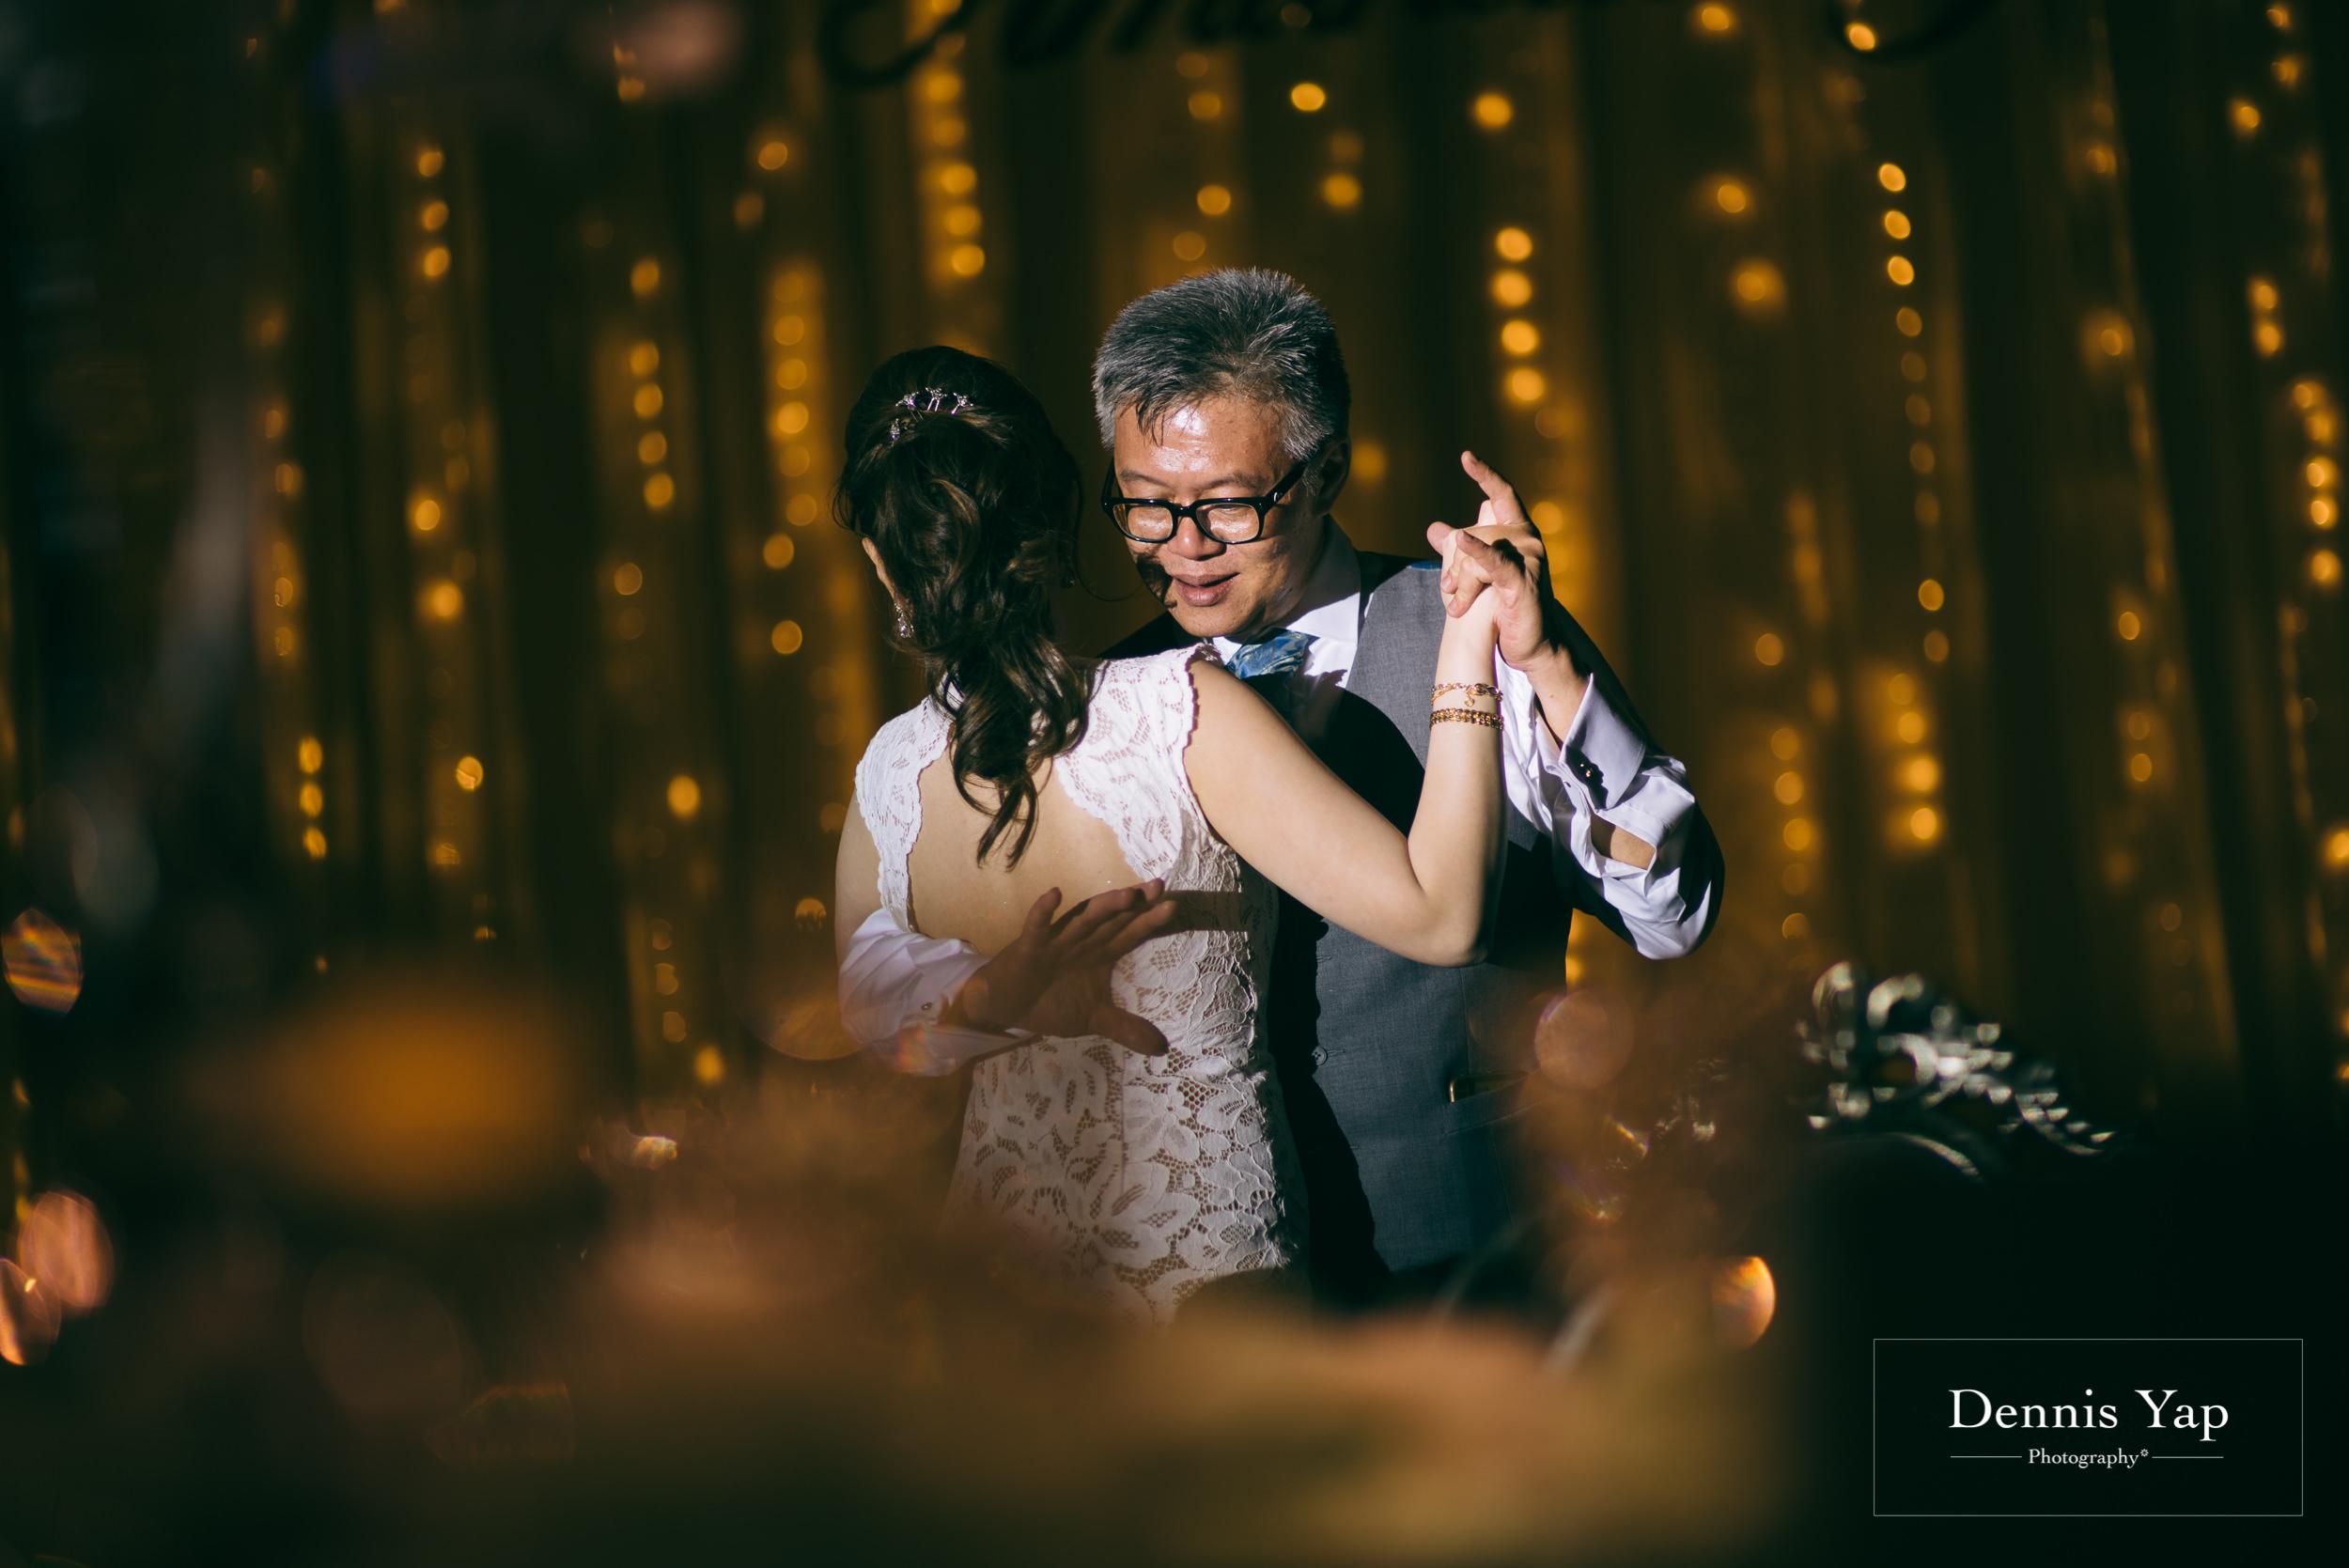 jordan amanda wedding day westin hotel kuala lumpur choe family dennis yap photography-33.jpg